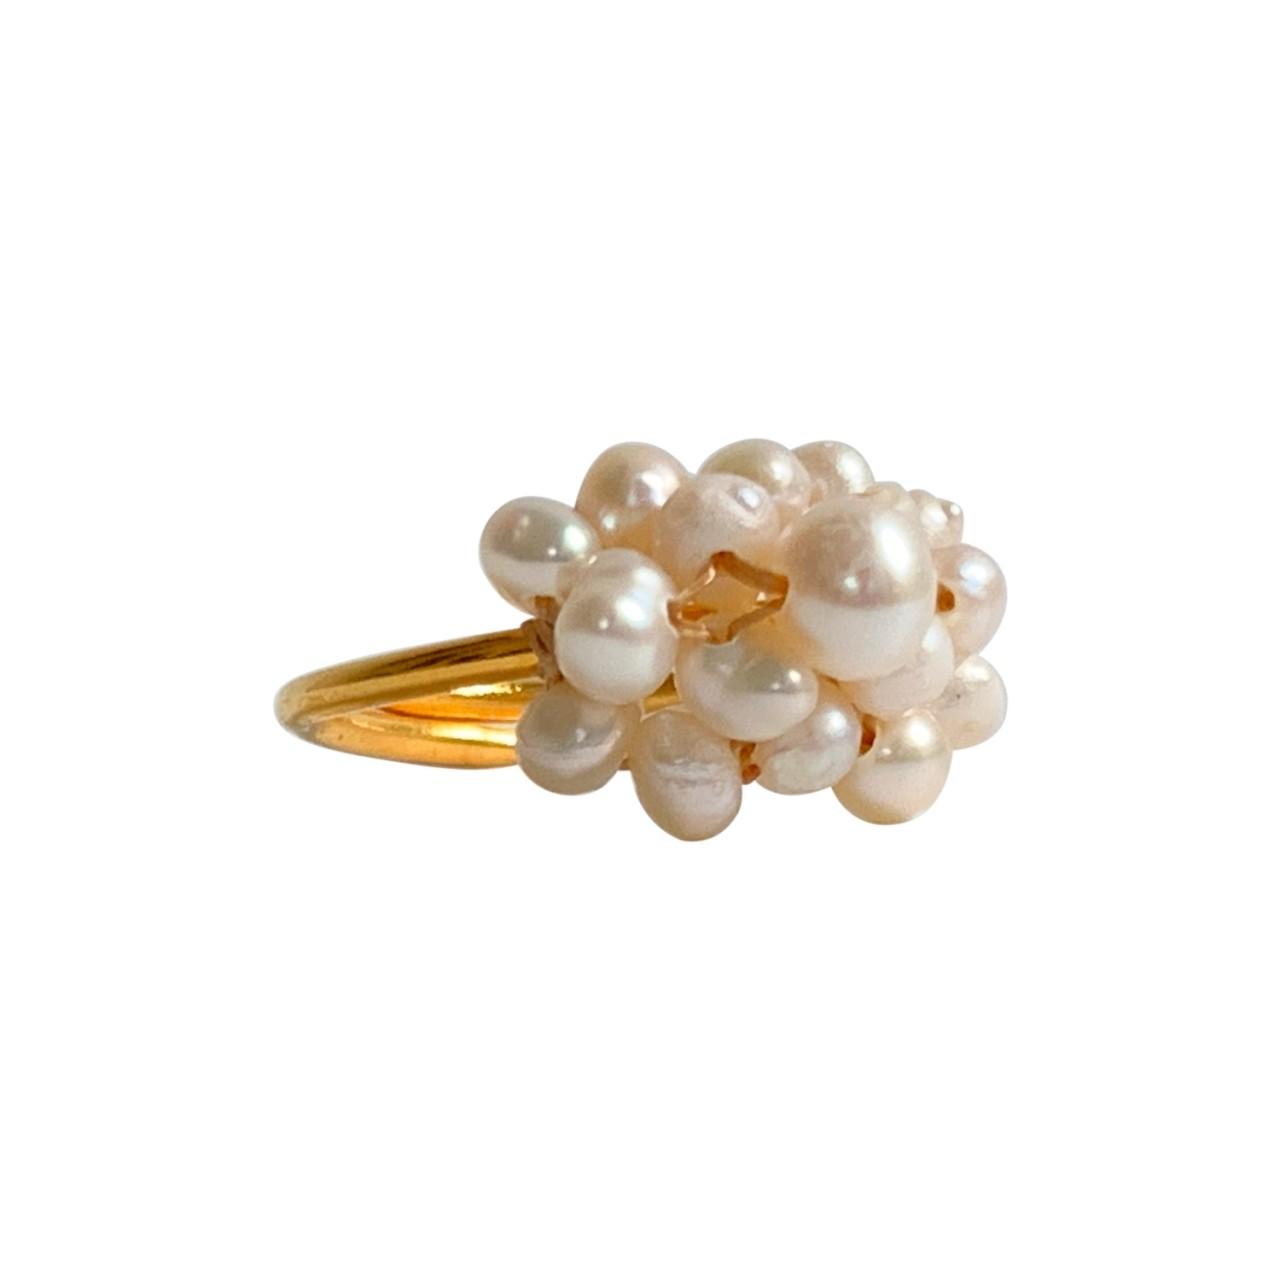 Ibu Jewels: Modell 'Ring Pearl Bunch - Gold'